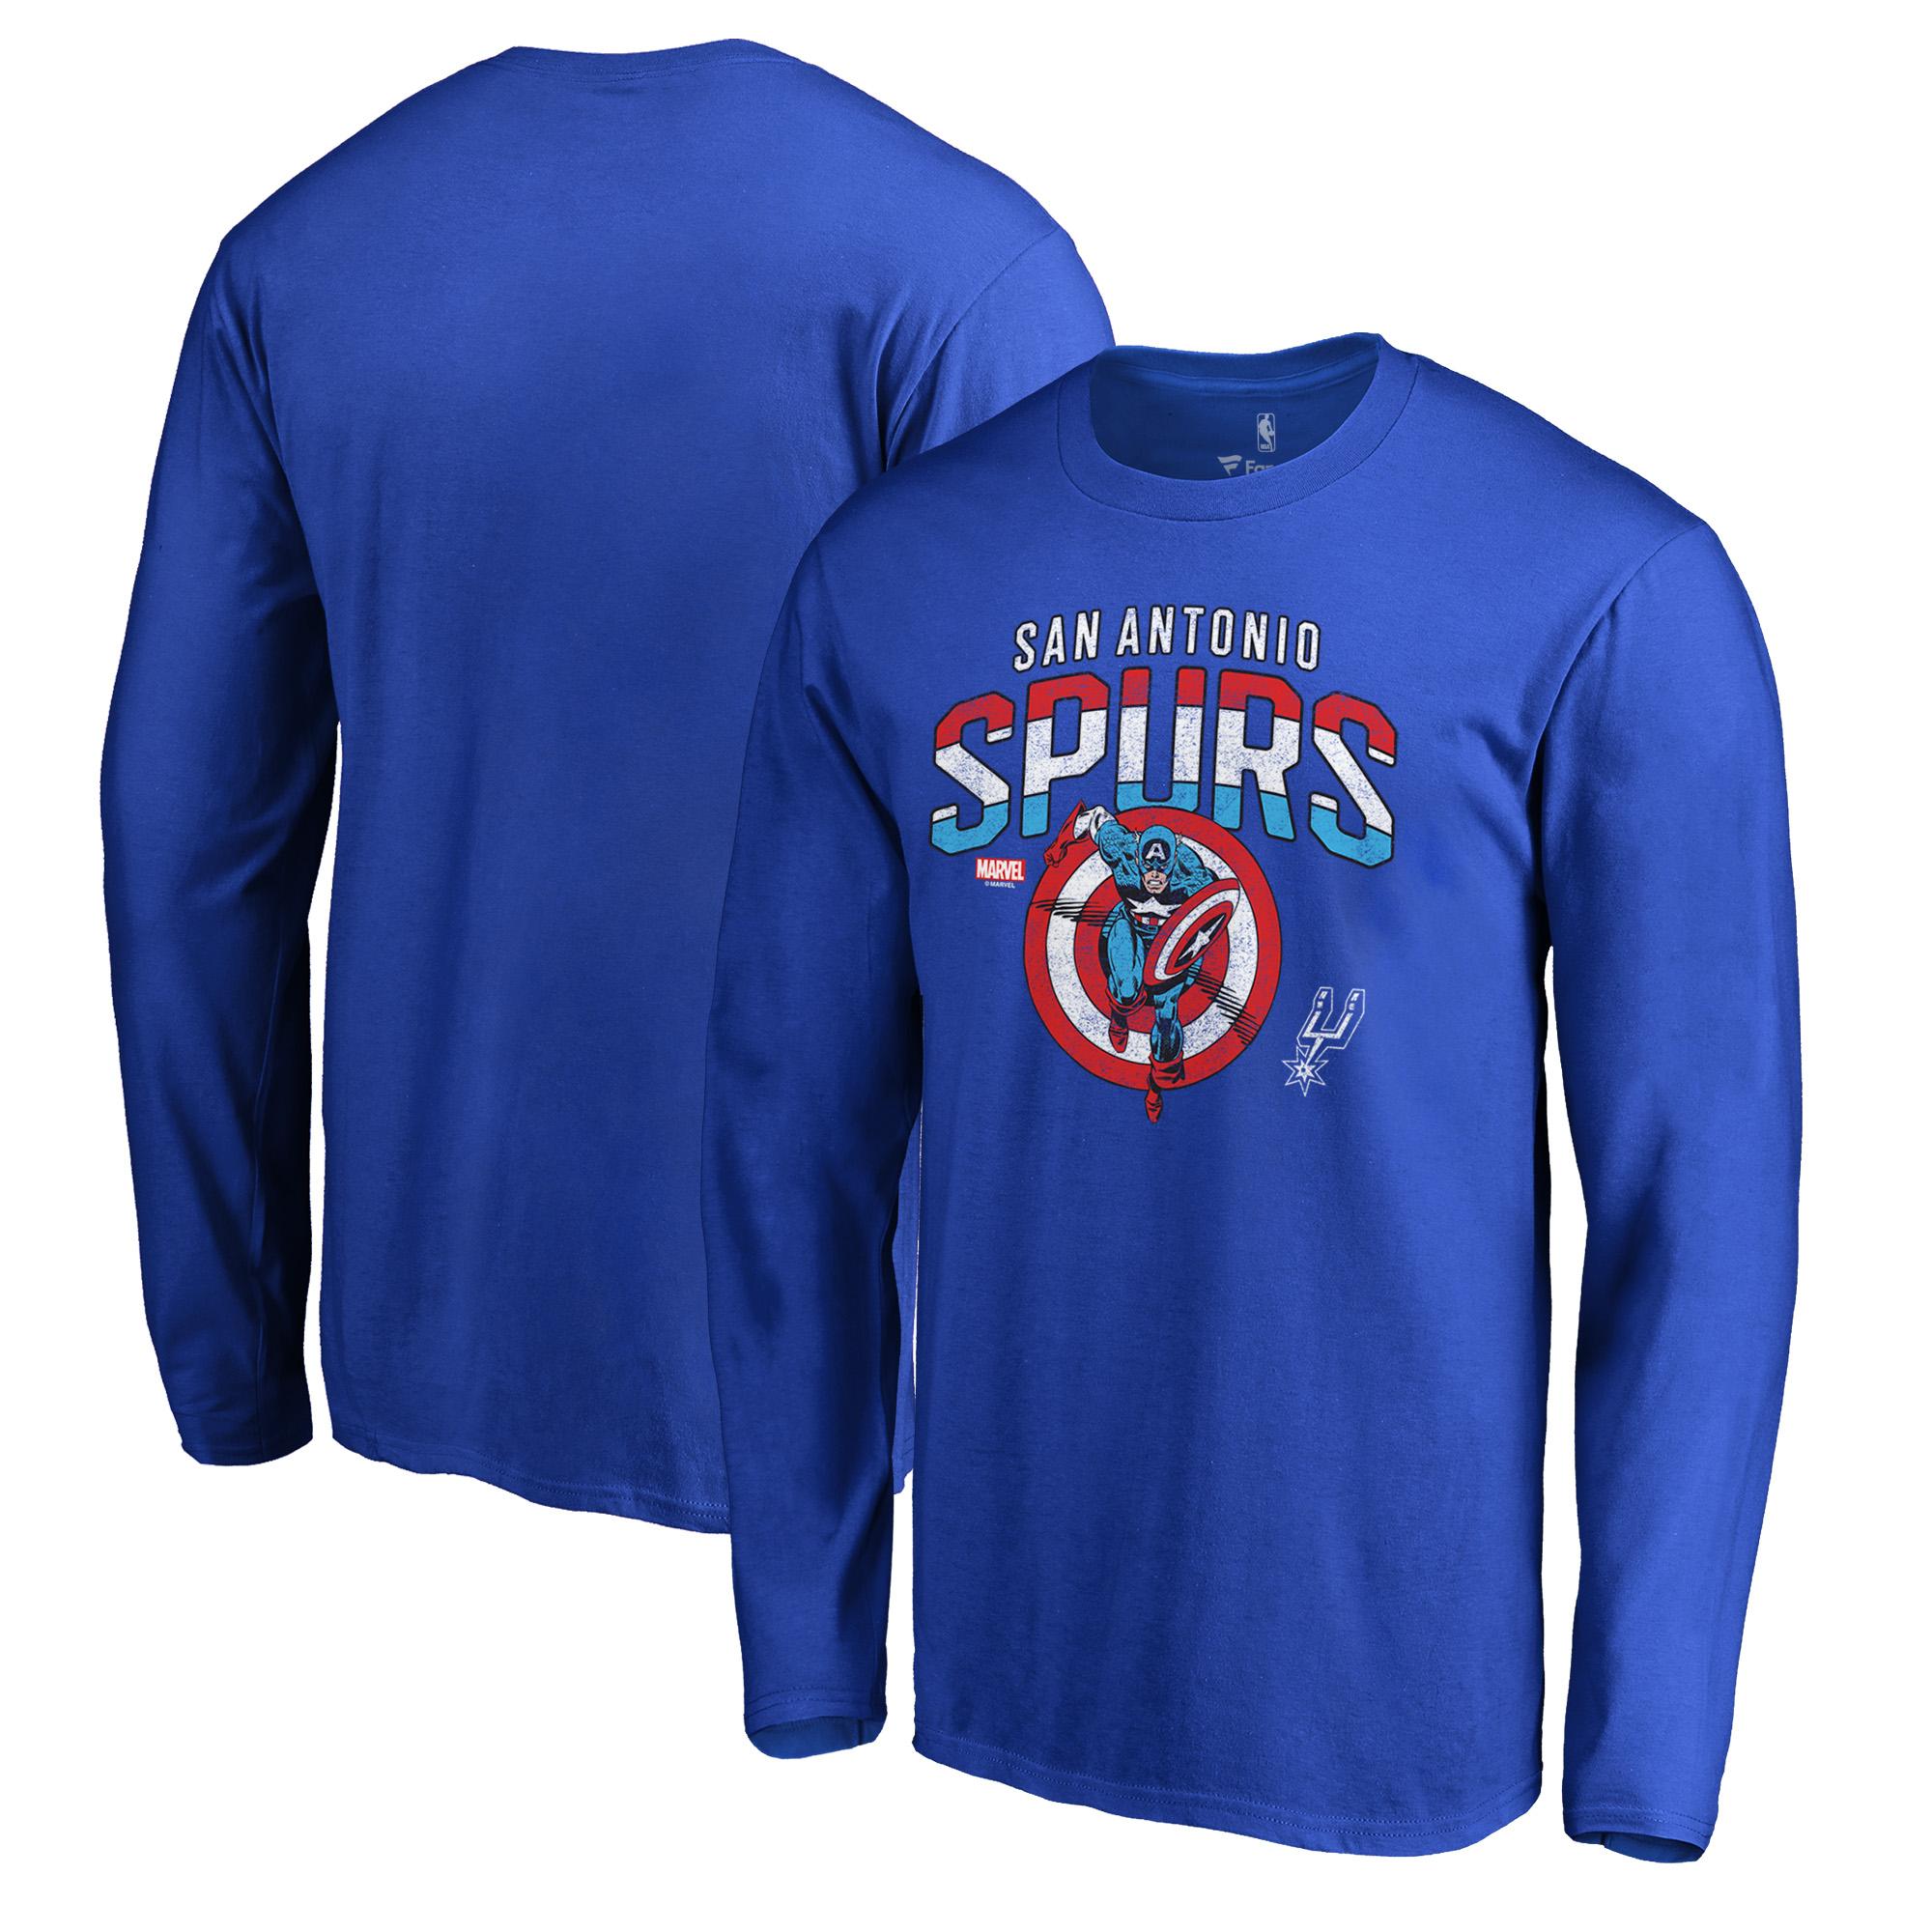 San Antonio Spurs Fanatics Branded Captain's Shield Long Sleeve T-Shirt - Royal